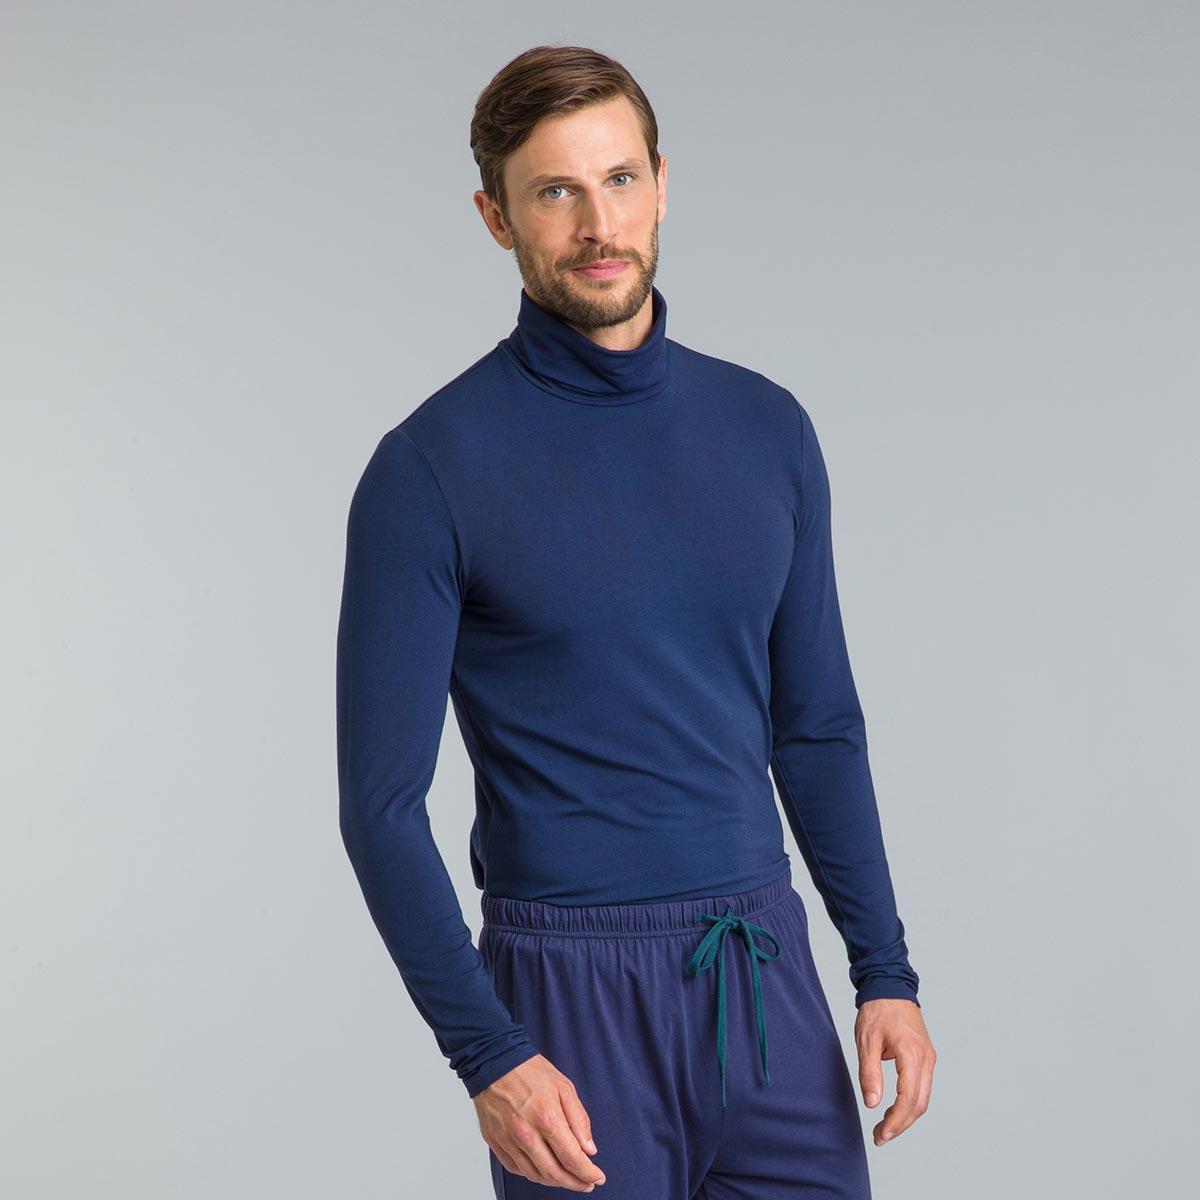 Tee-shirt de pyjama manches longues col roulé bleu marine